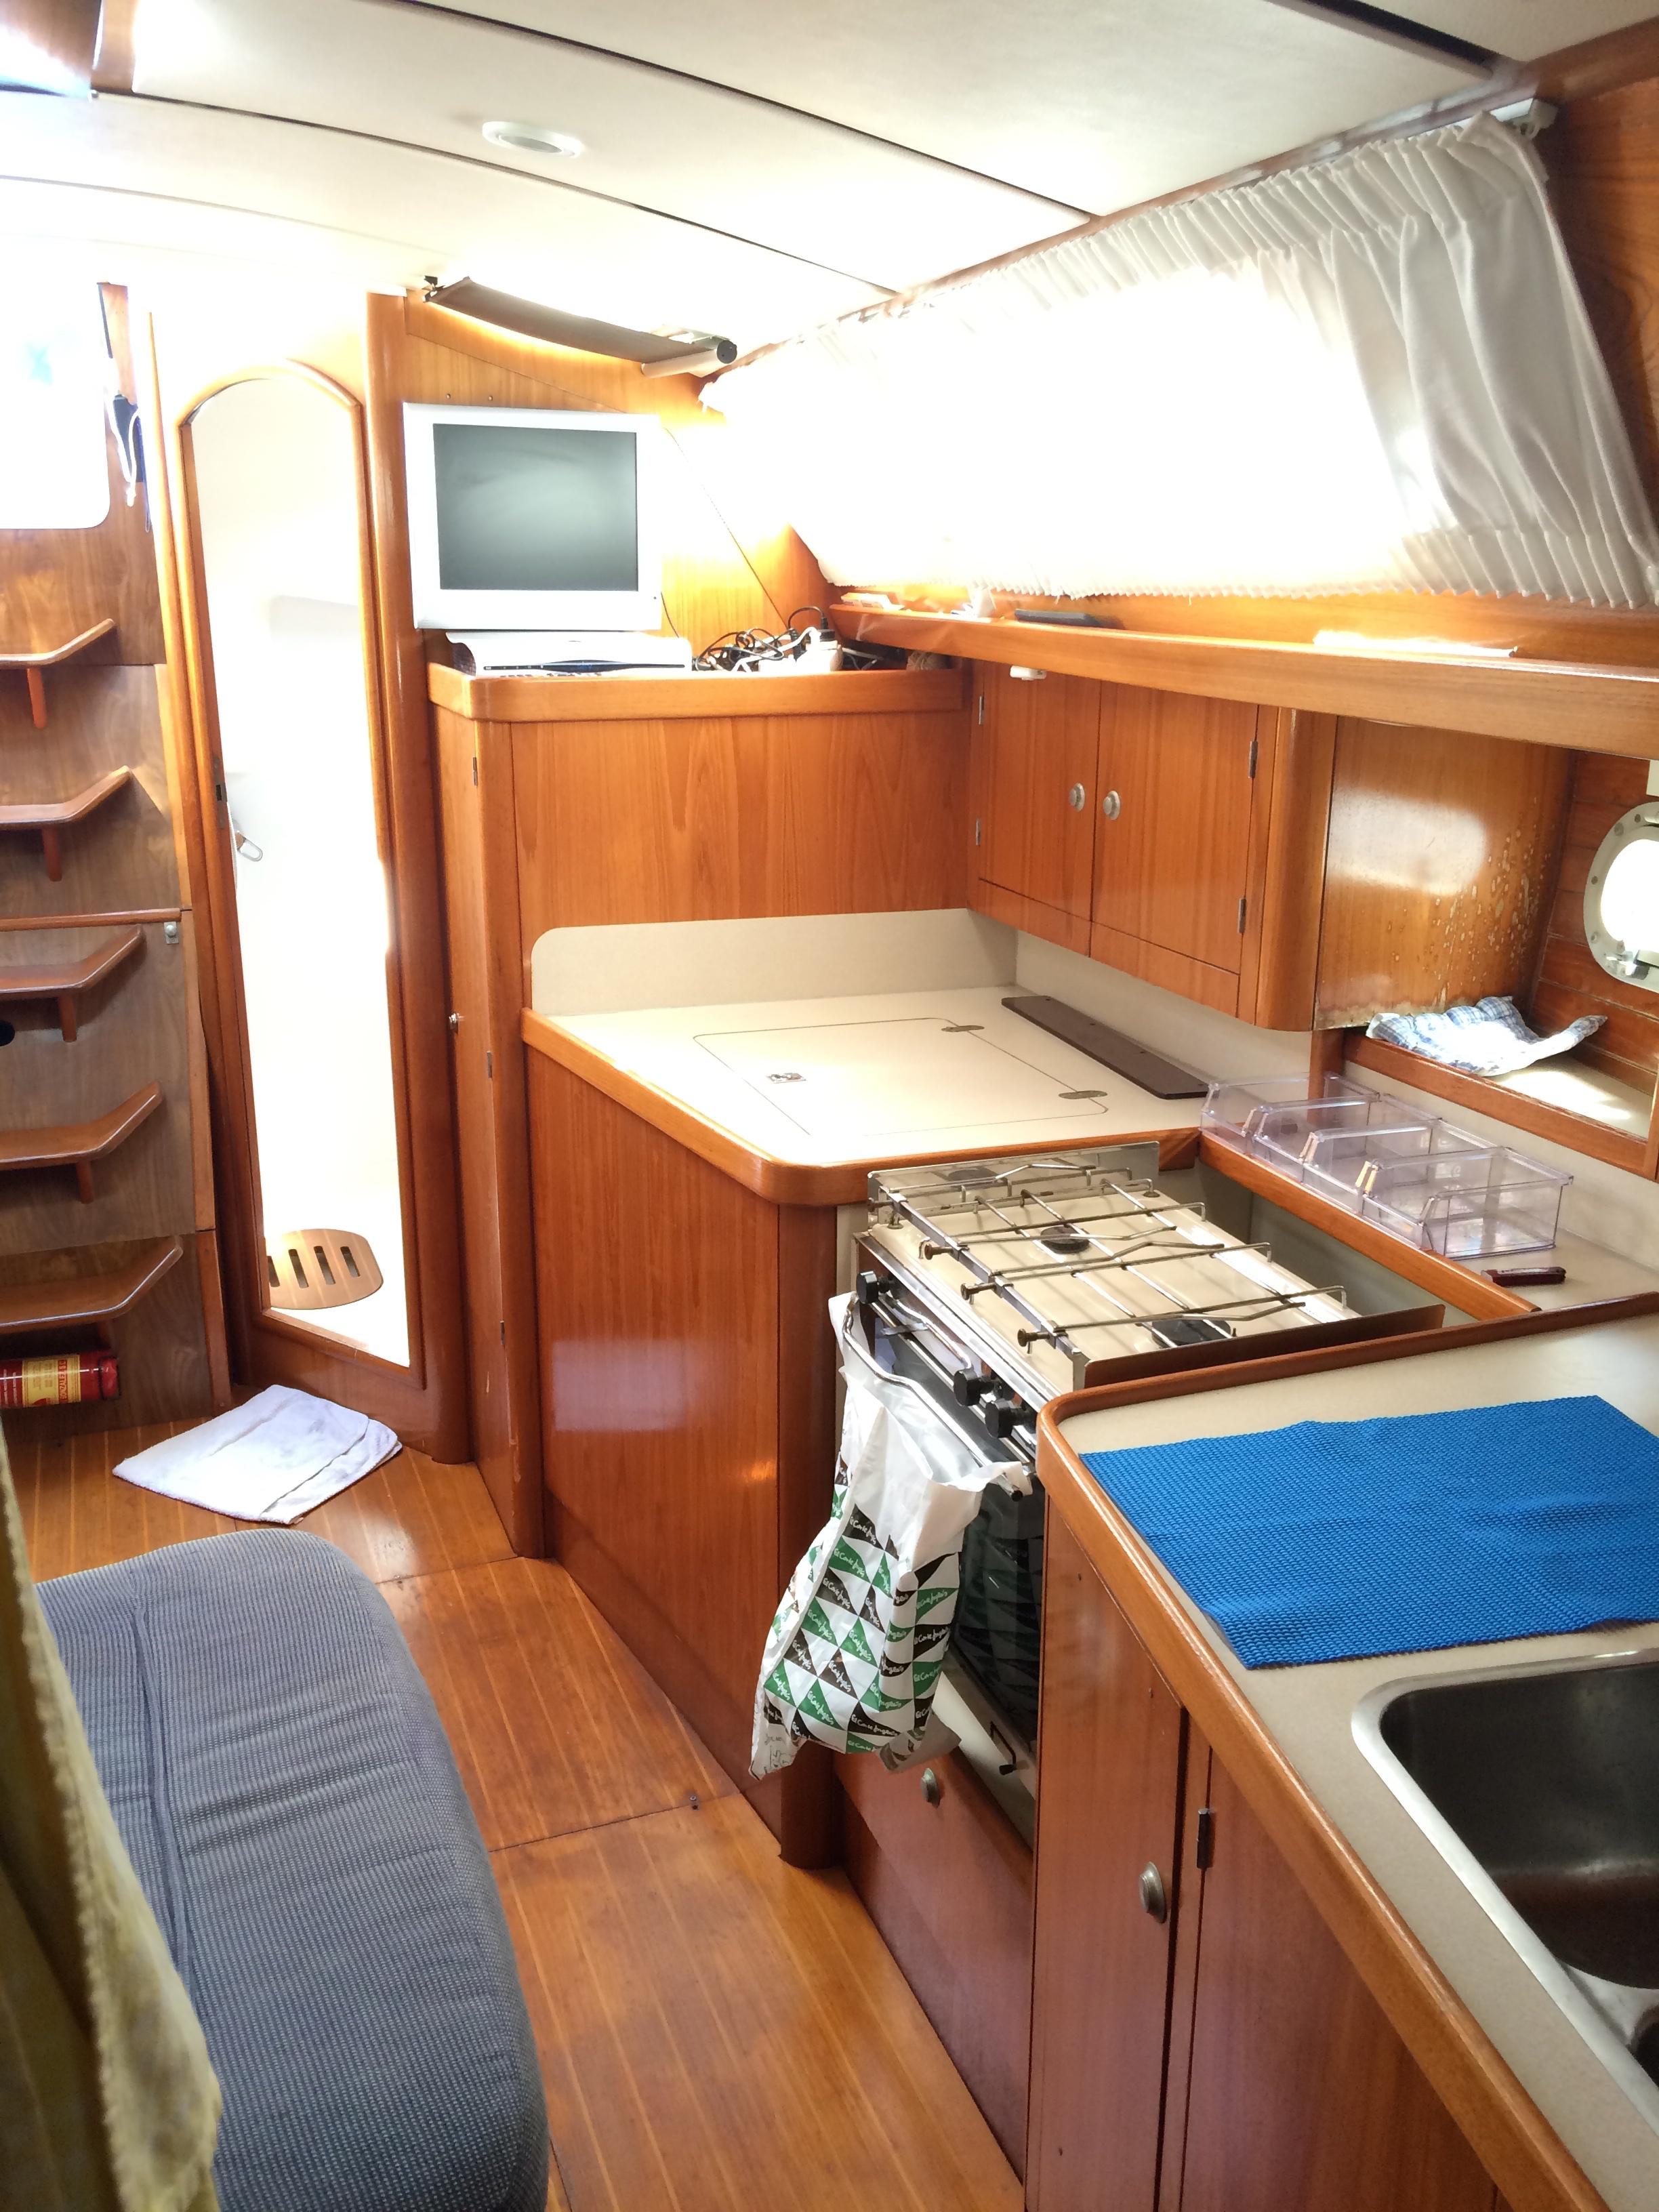 Kitchen of the Sun Odyssey 37.1 / Cocina del Sun Odyssey 37.1